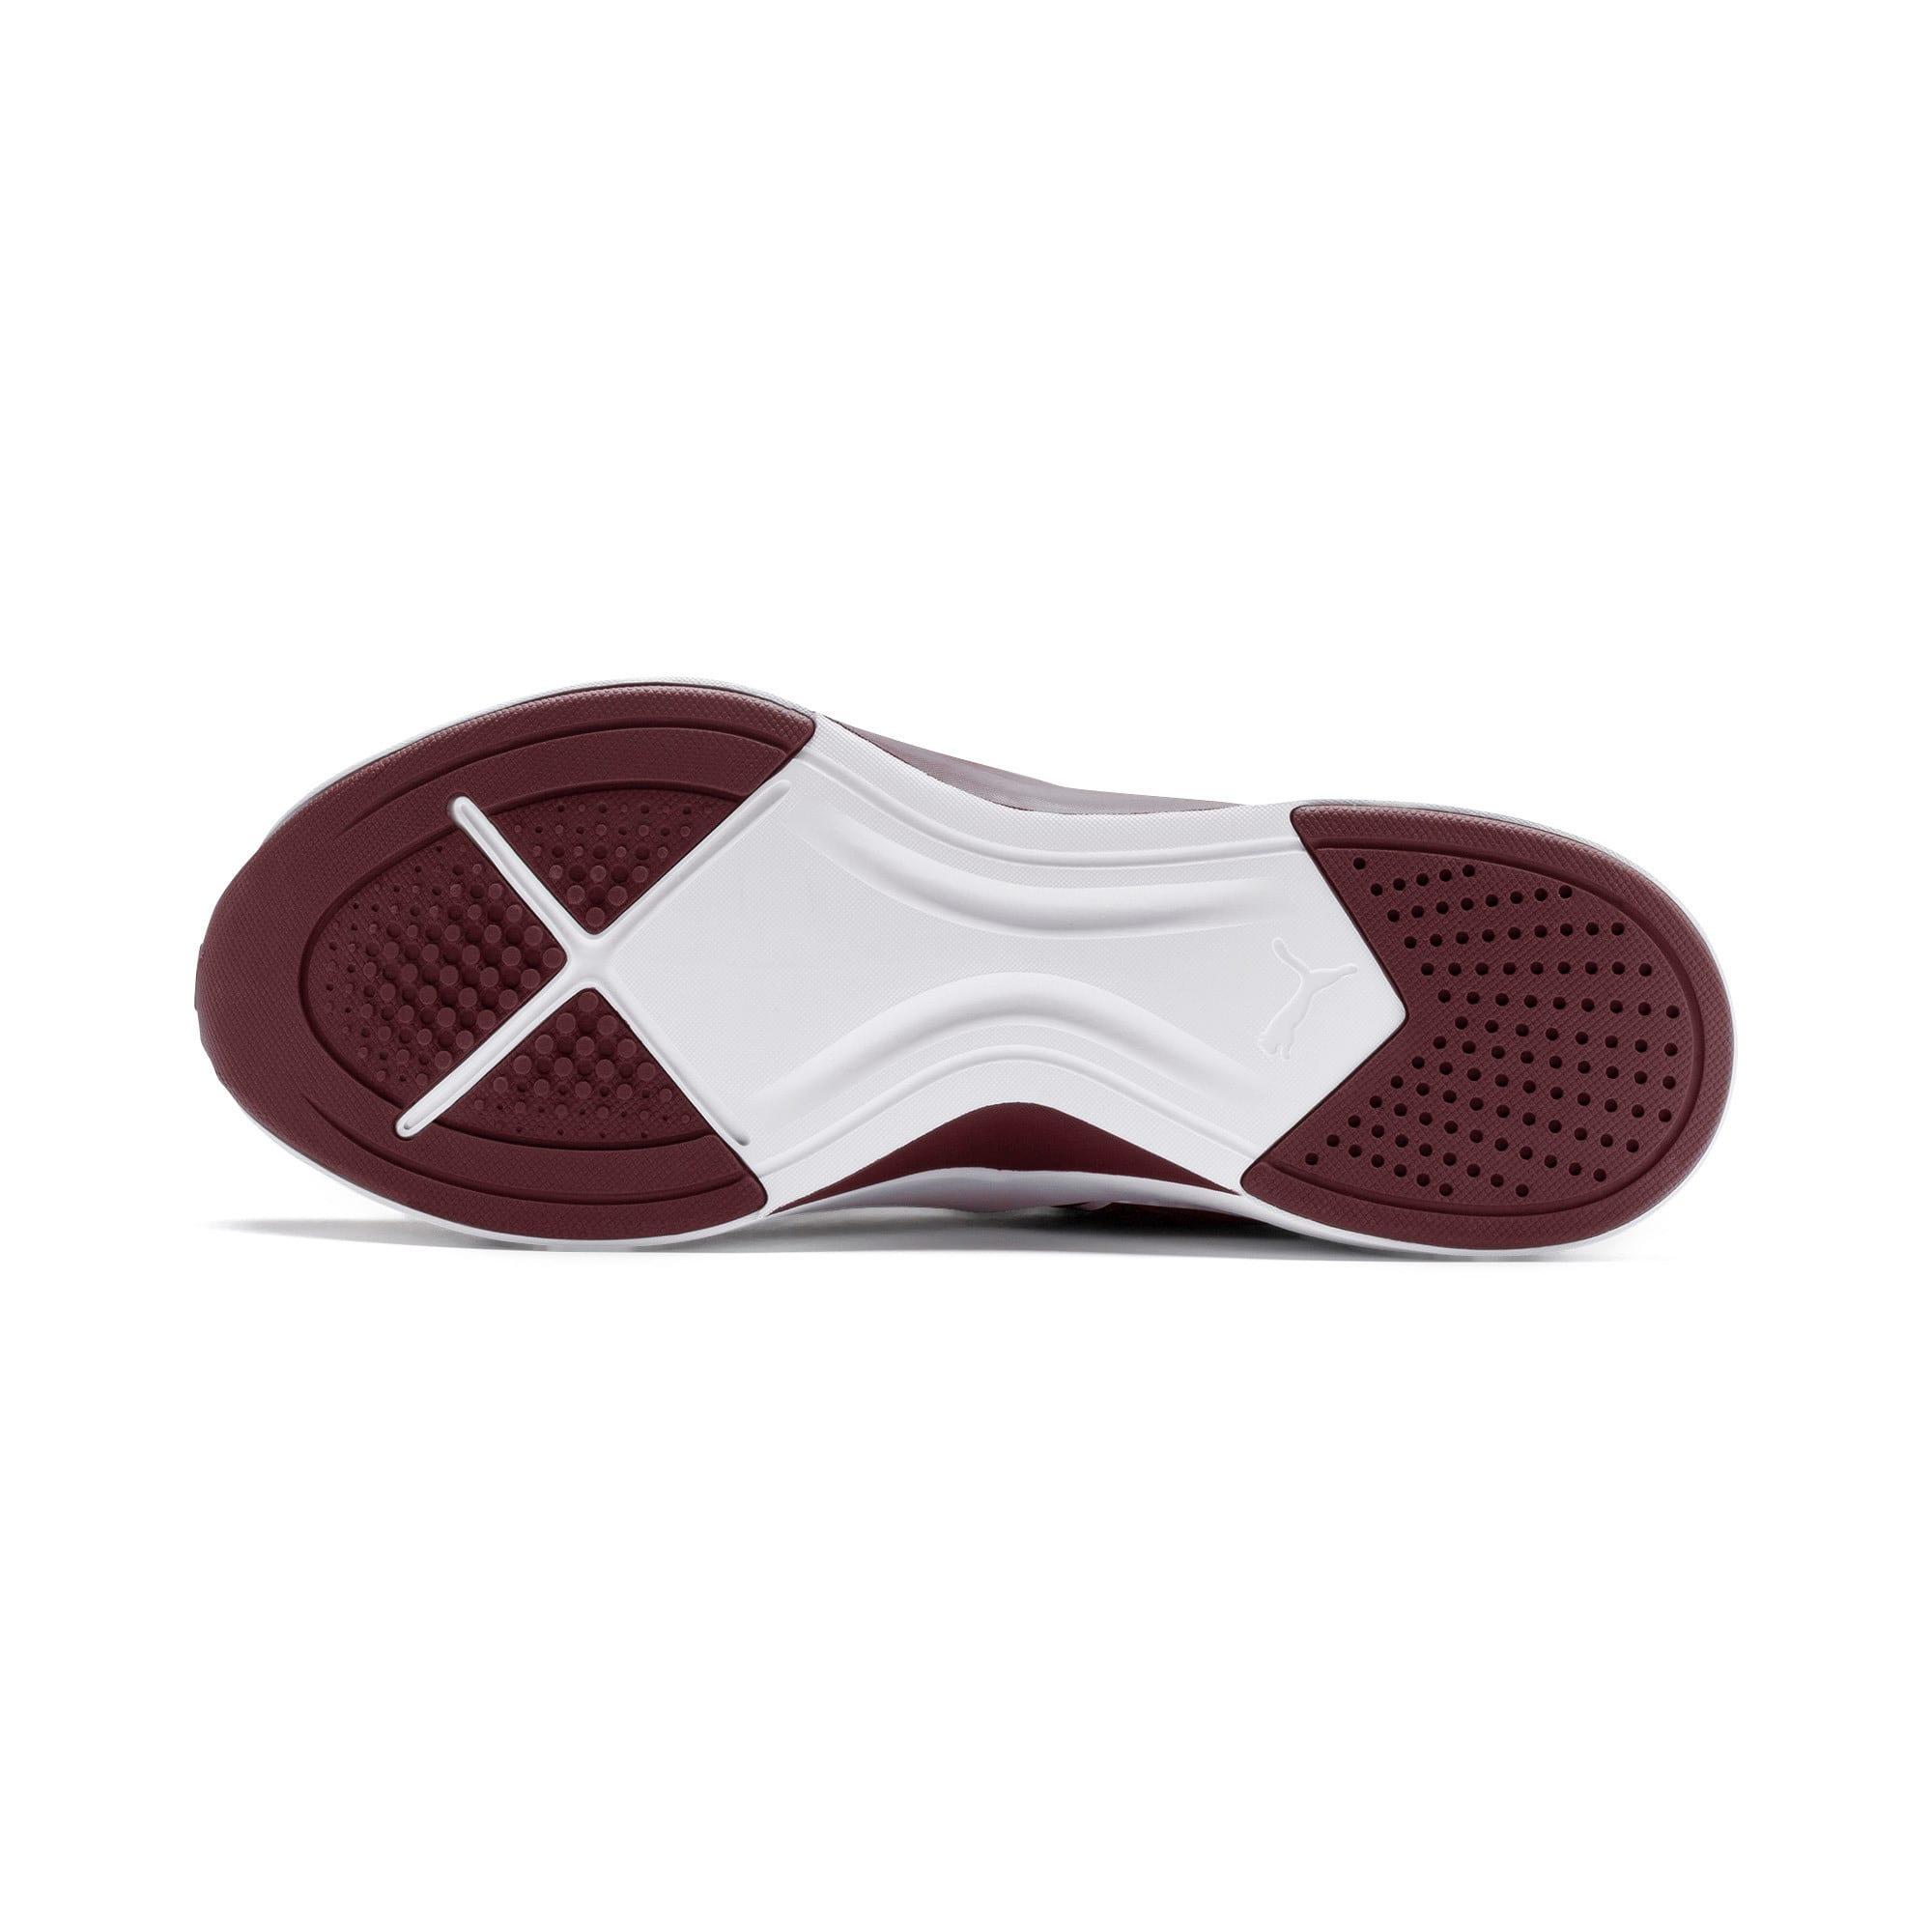 Imagen en miniatura 5 de Zapatillas de mujer Incite FS, Vineyard Wine-Puma White, mediana